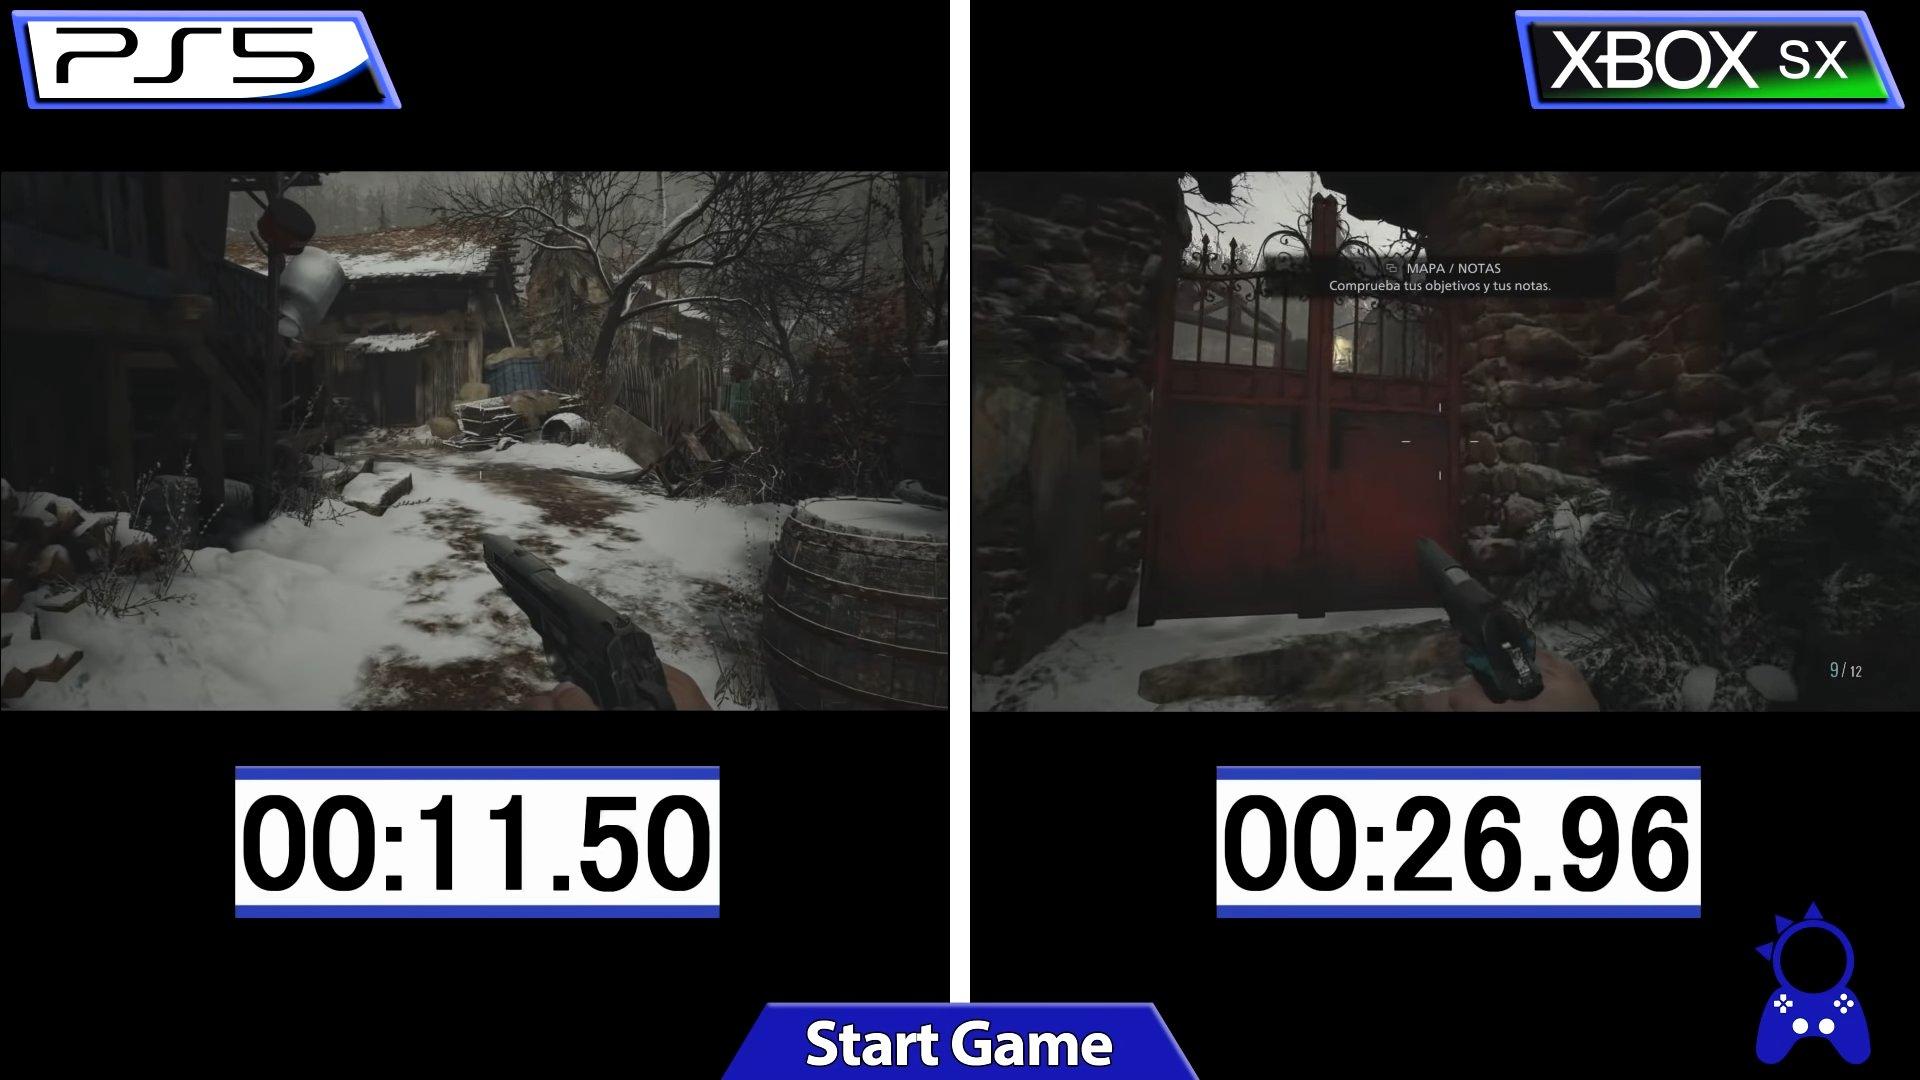 223137-Playstation%205%20VS%20Xbox%20Ser